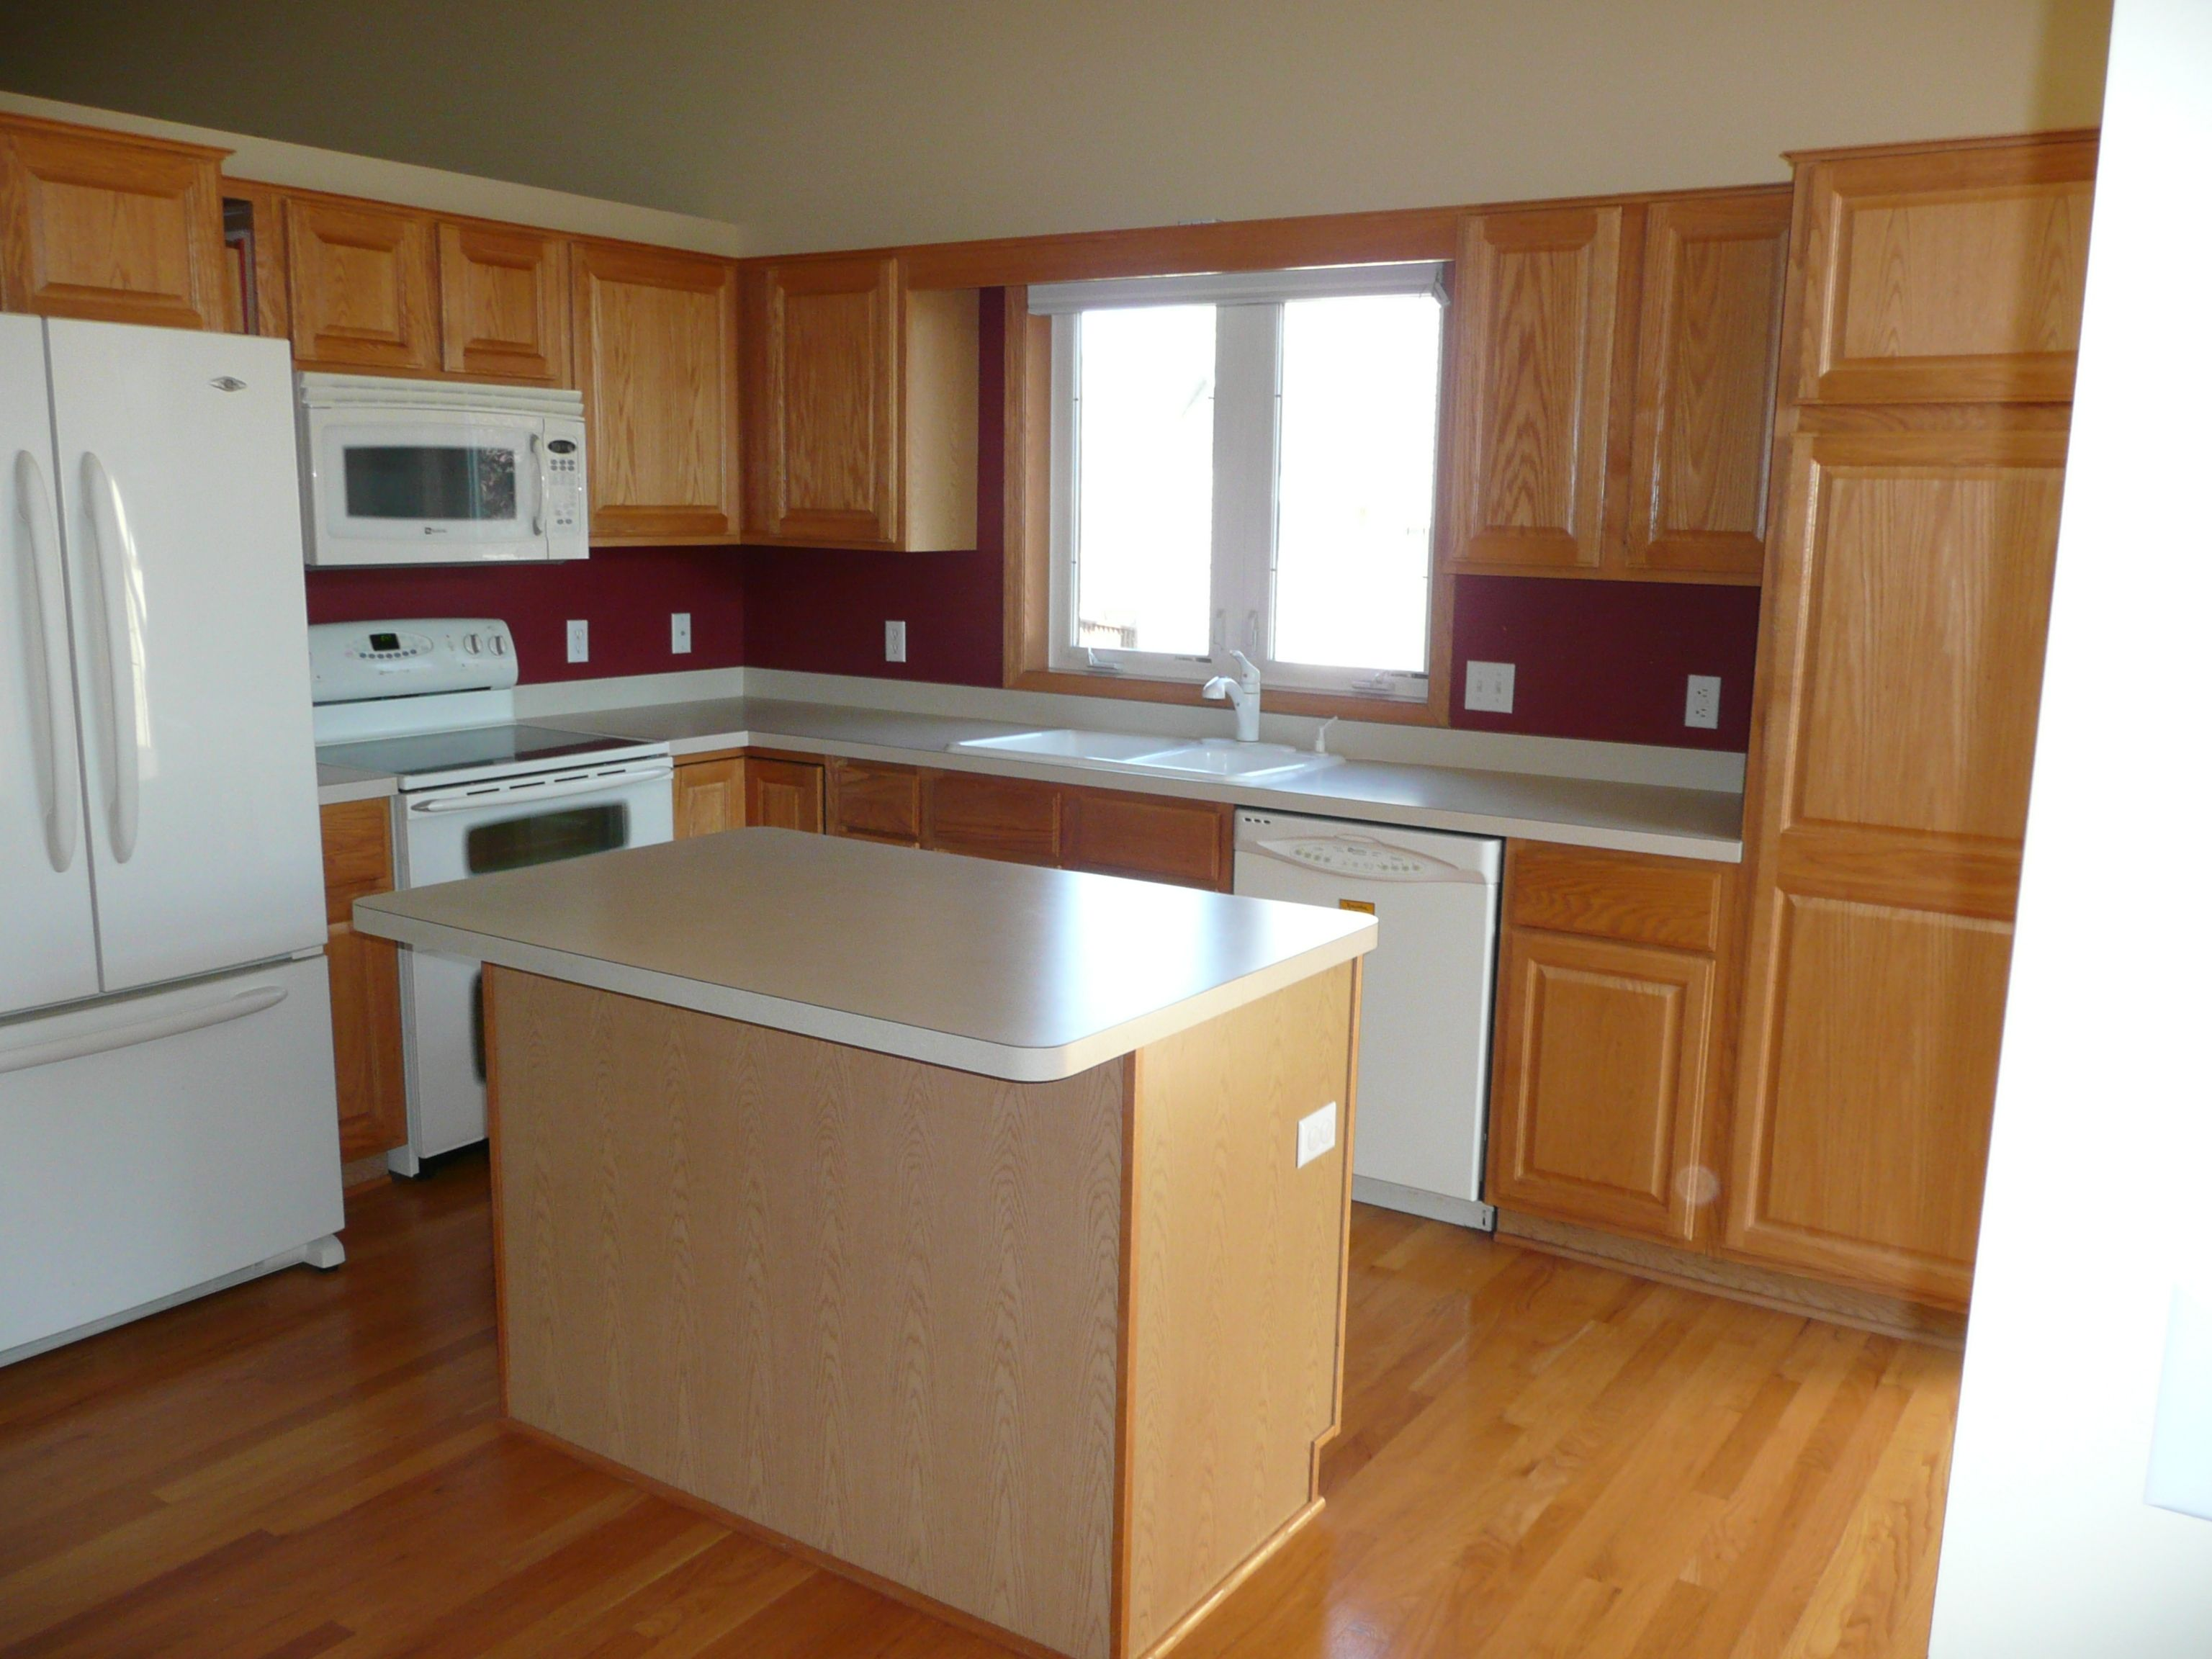 Virtual kitchen laminate countertops navigatorspbfo